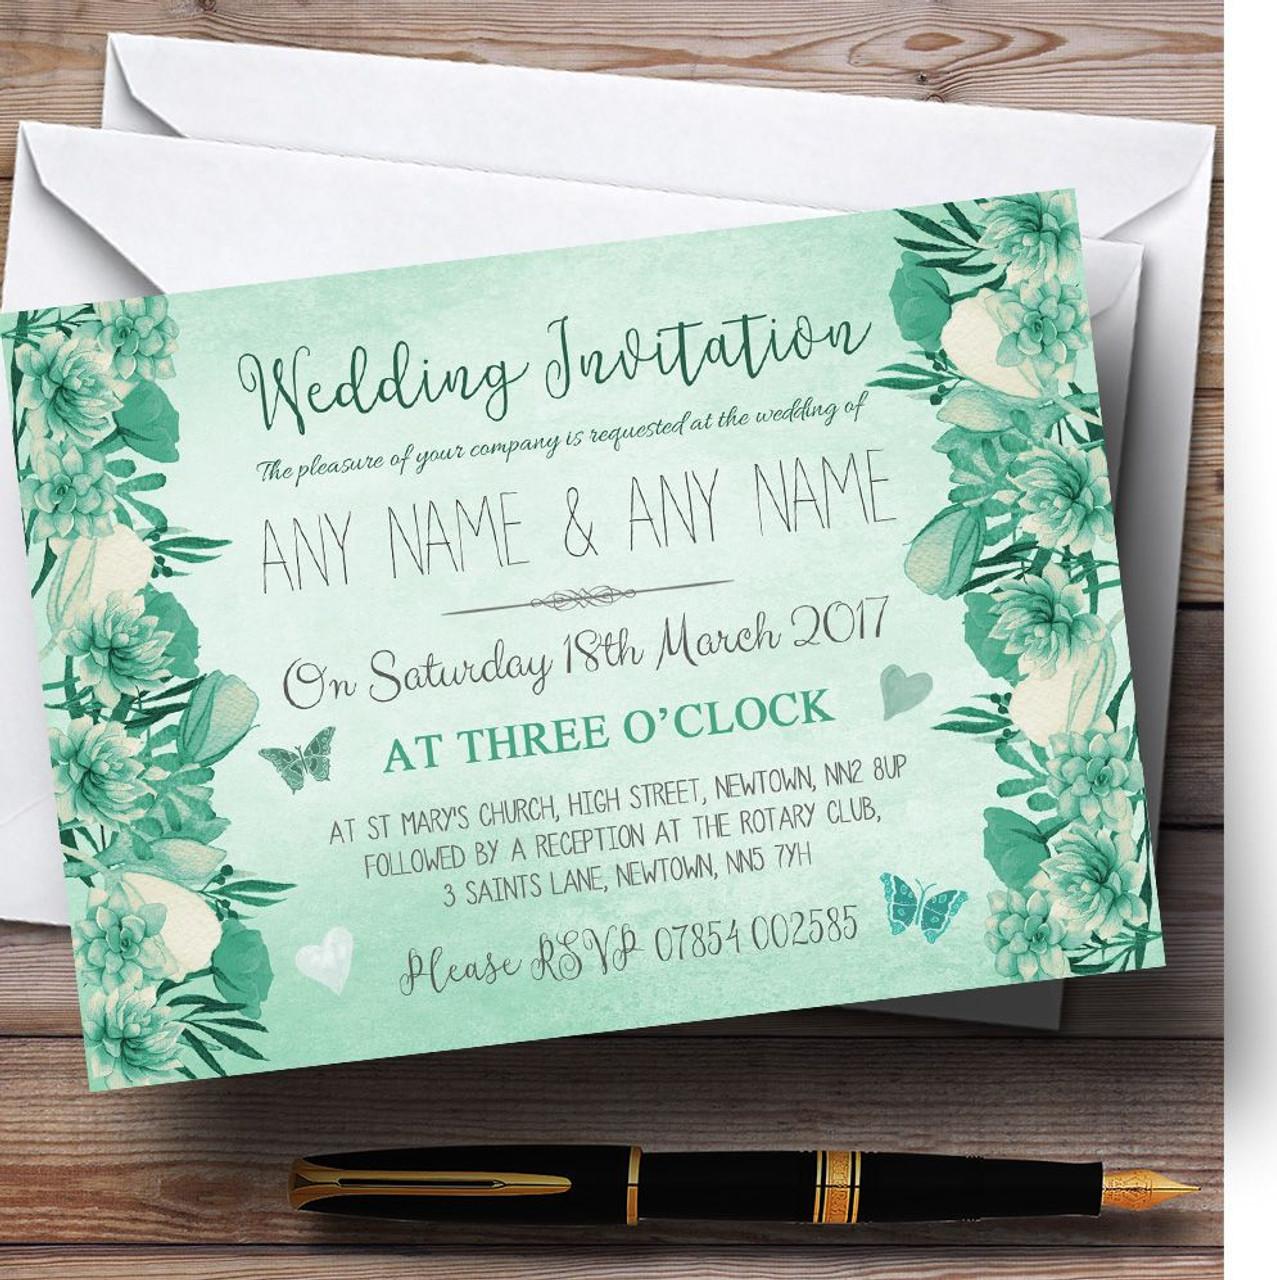 Pale teal mint green vintage watercolour floral personalised wedding pale teal mint green vintage watercolour floral personalised wedding invitations solutioingenieria Choice Image